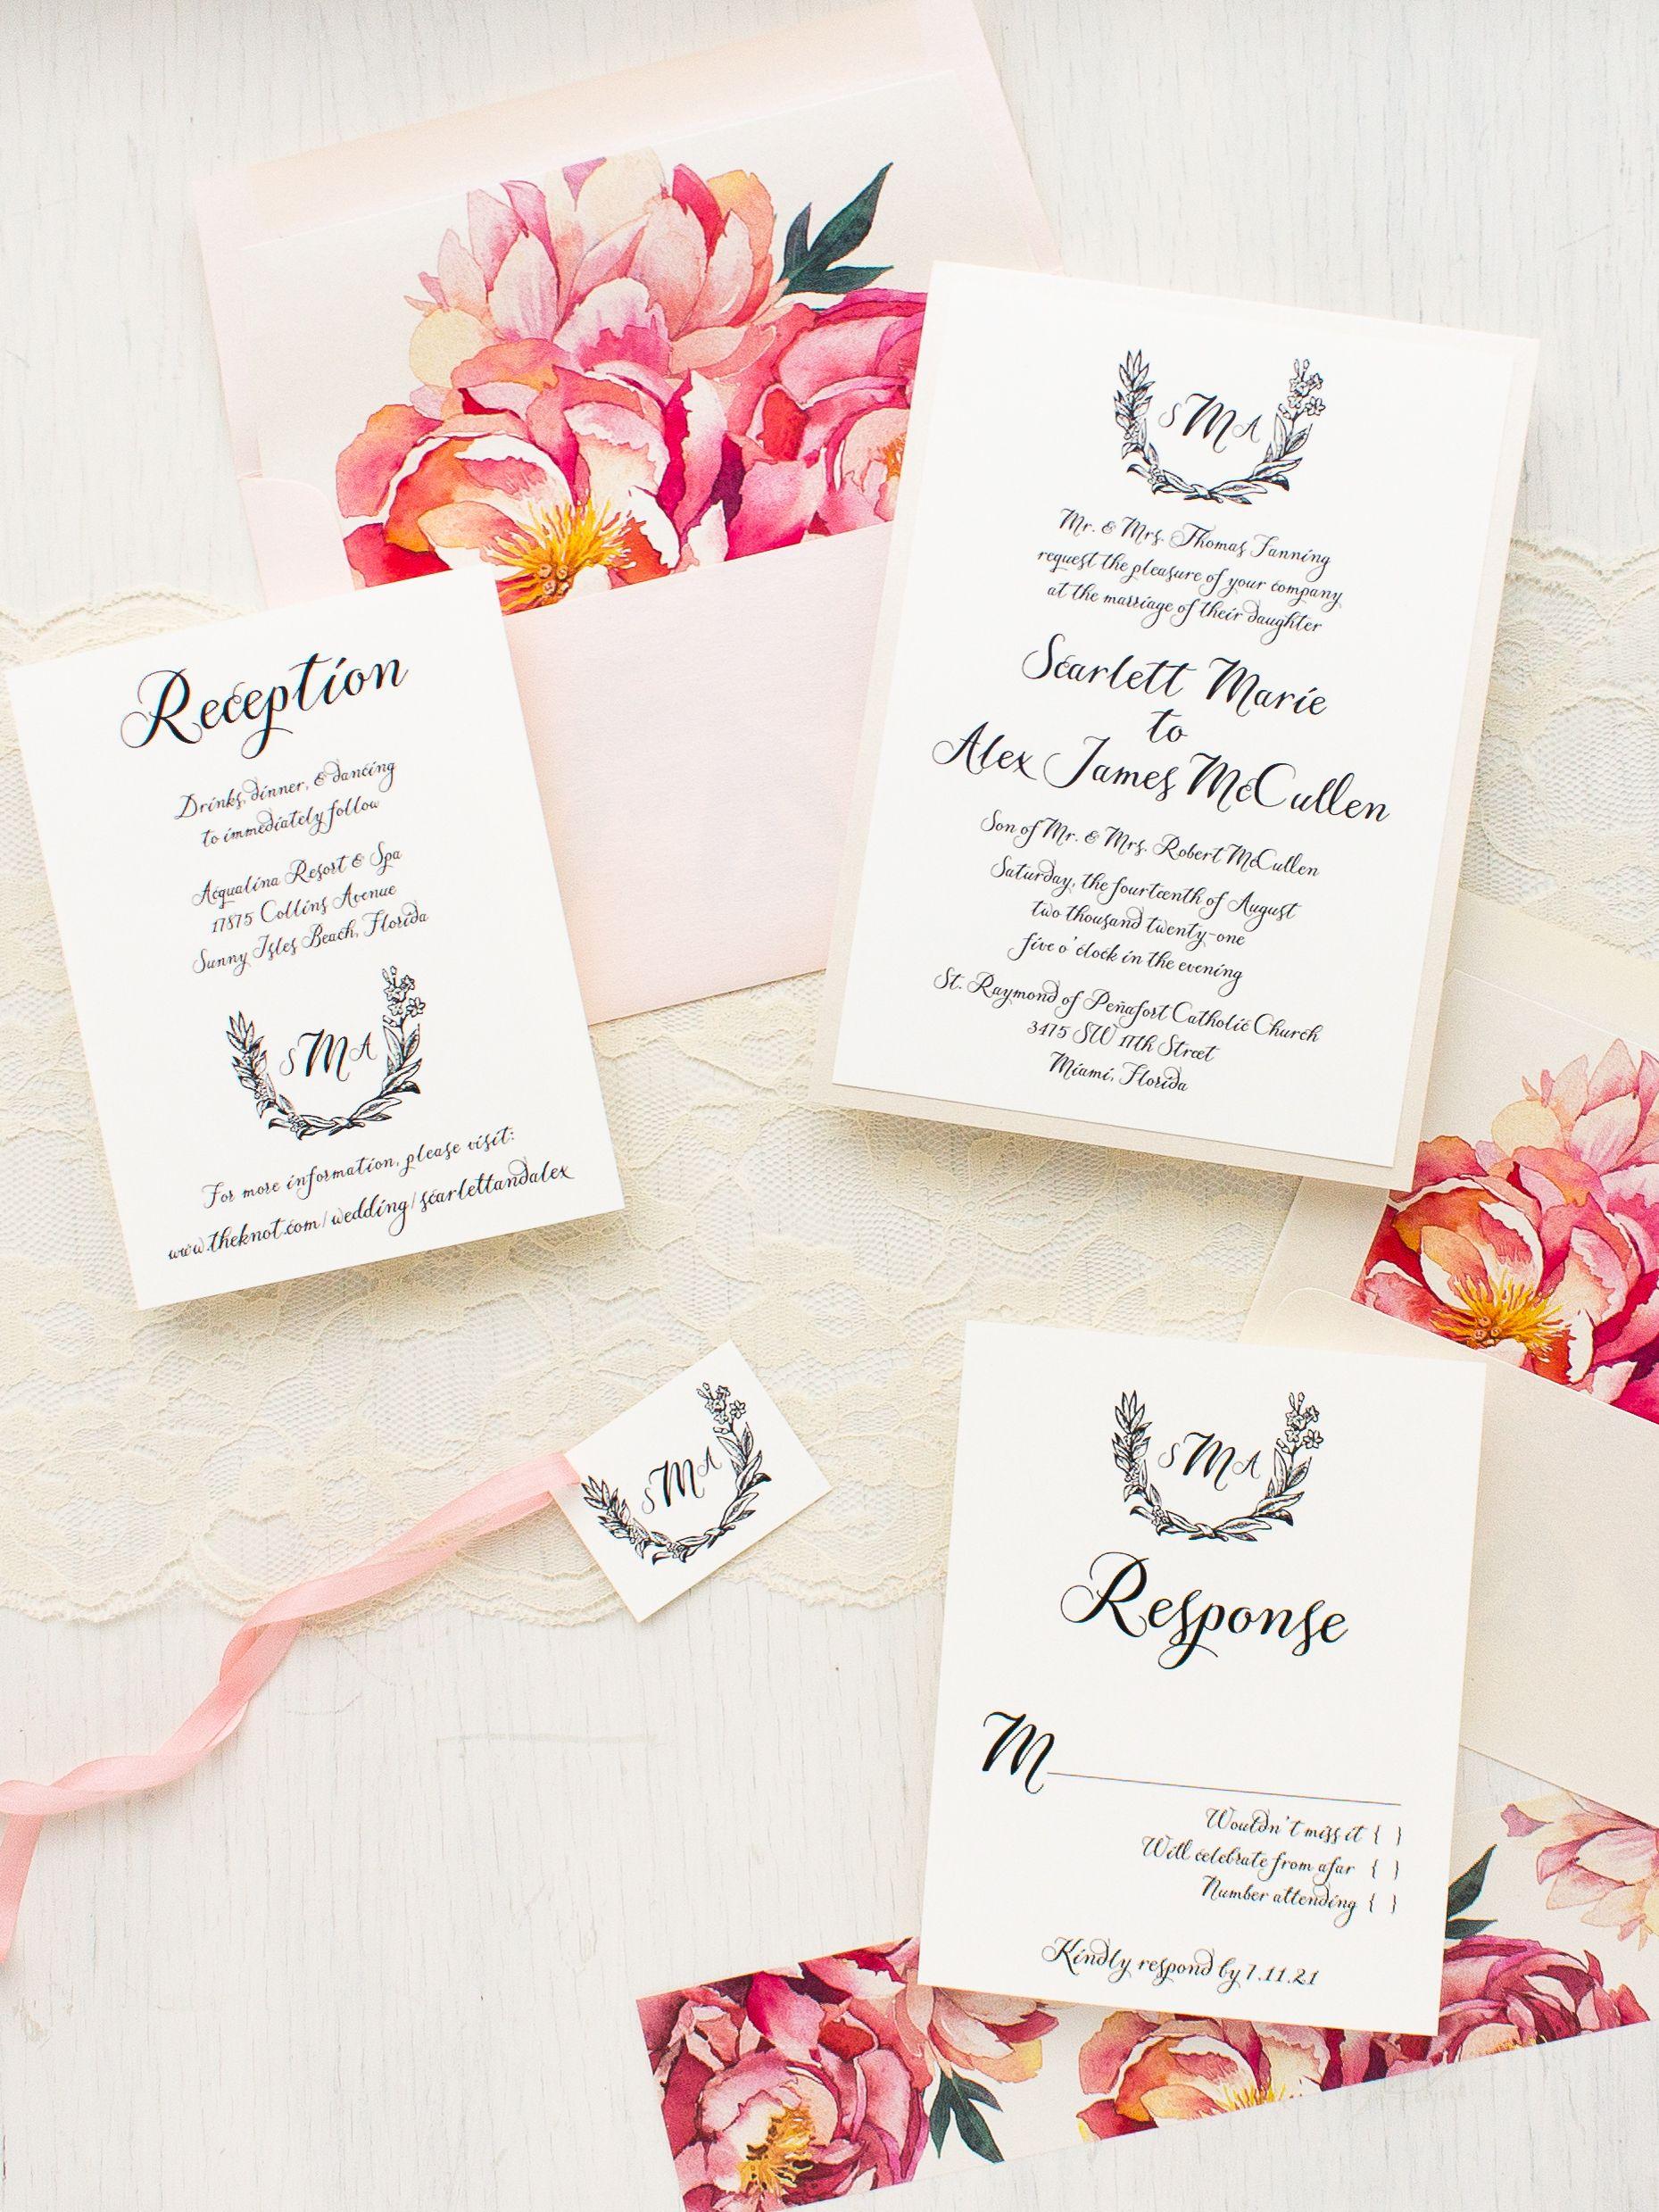 Pink Peonies Wedding Invitations | Peony, Blush pink weddings and ...